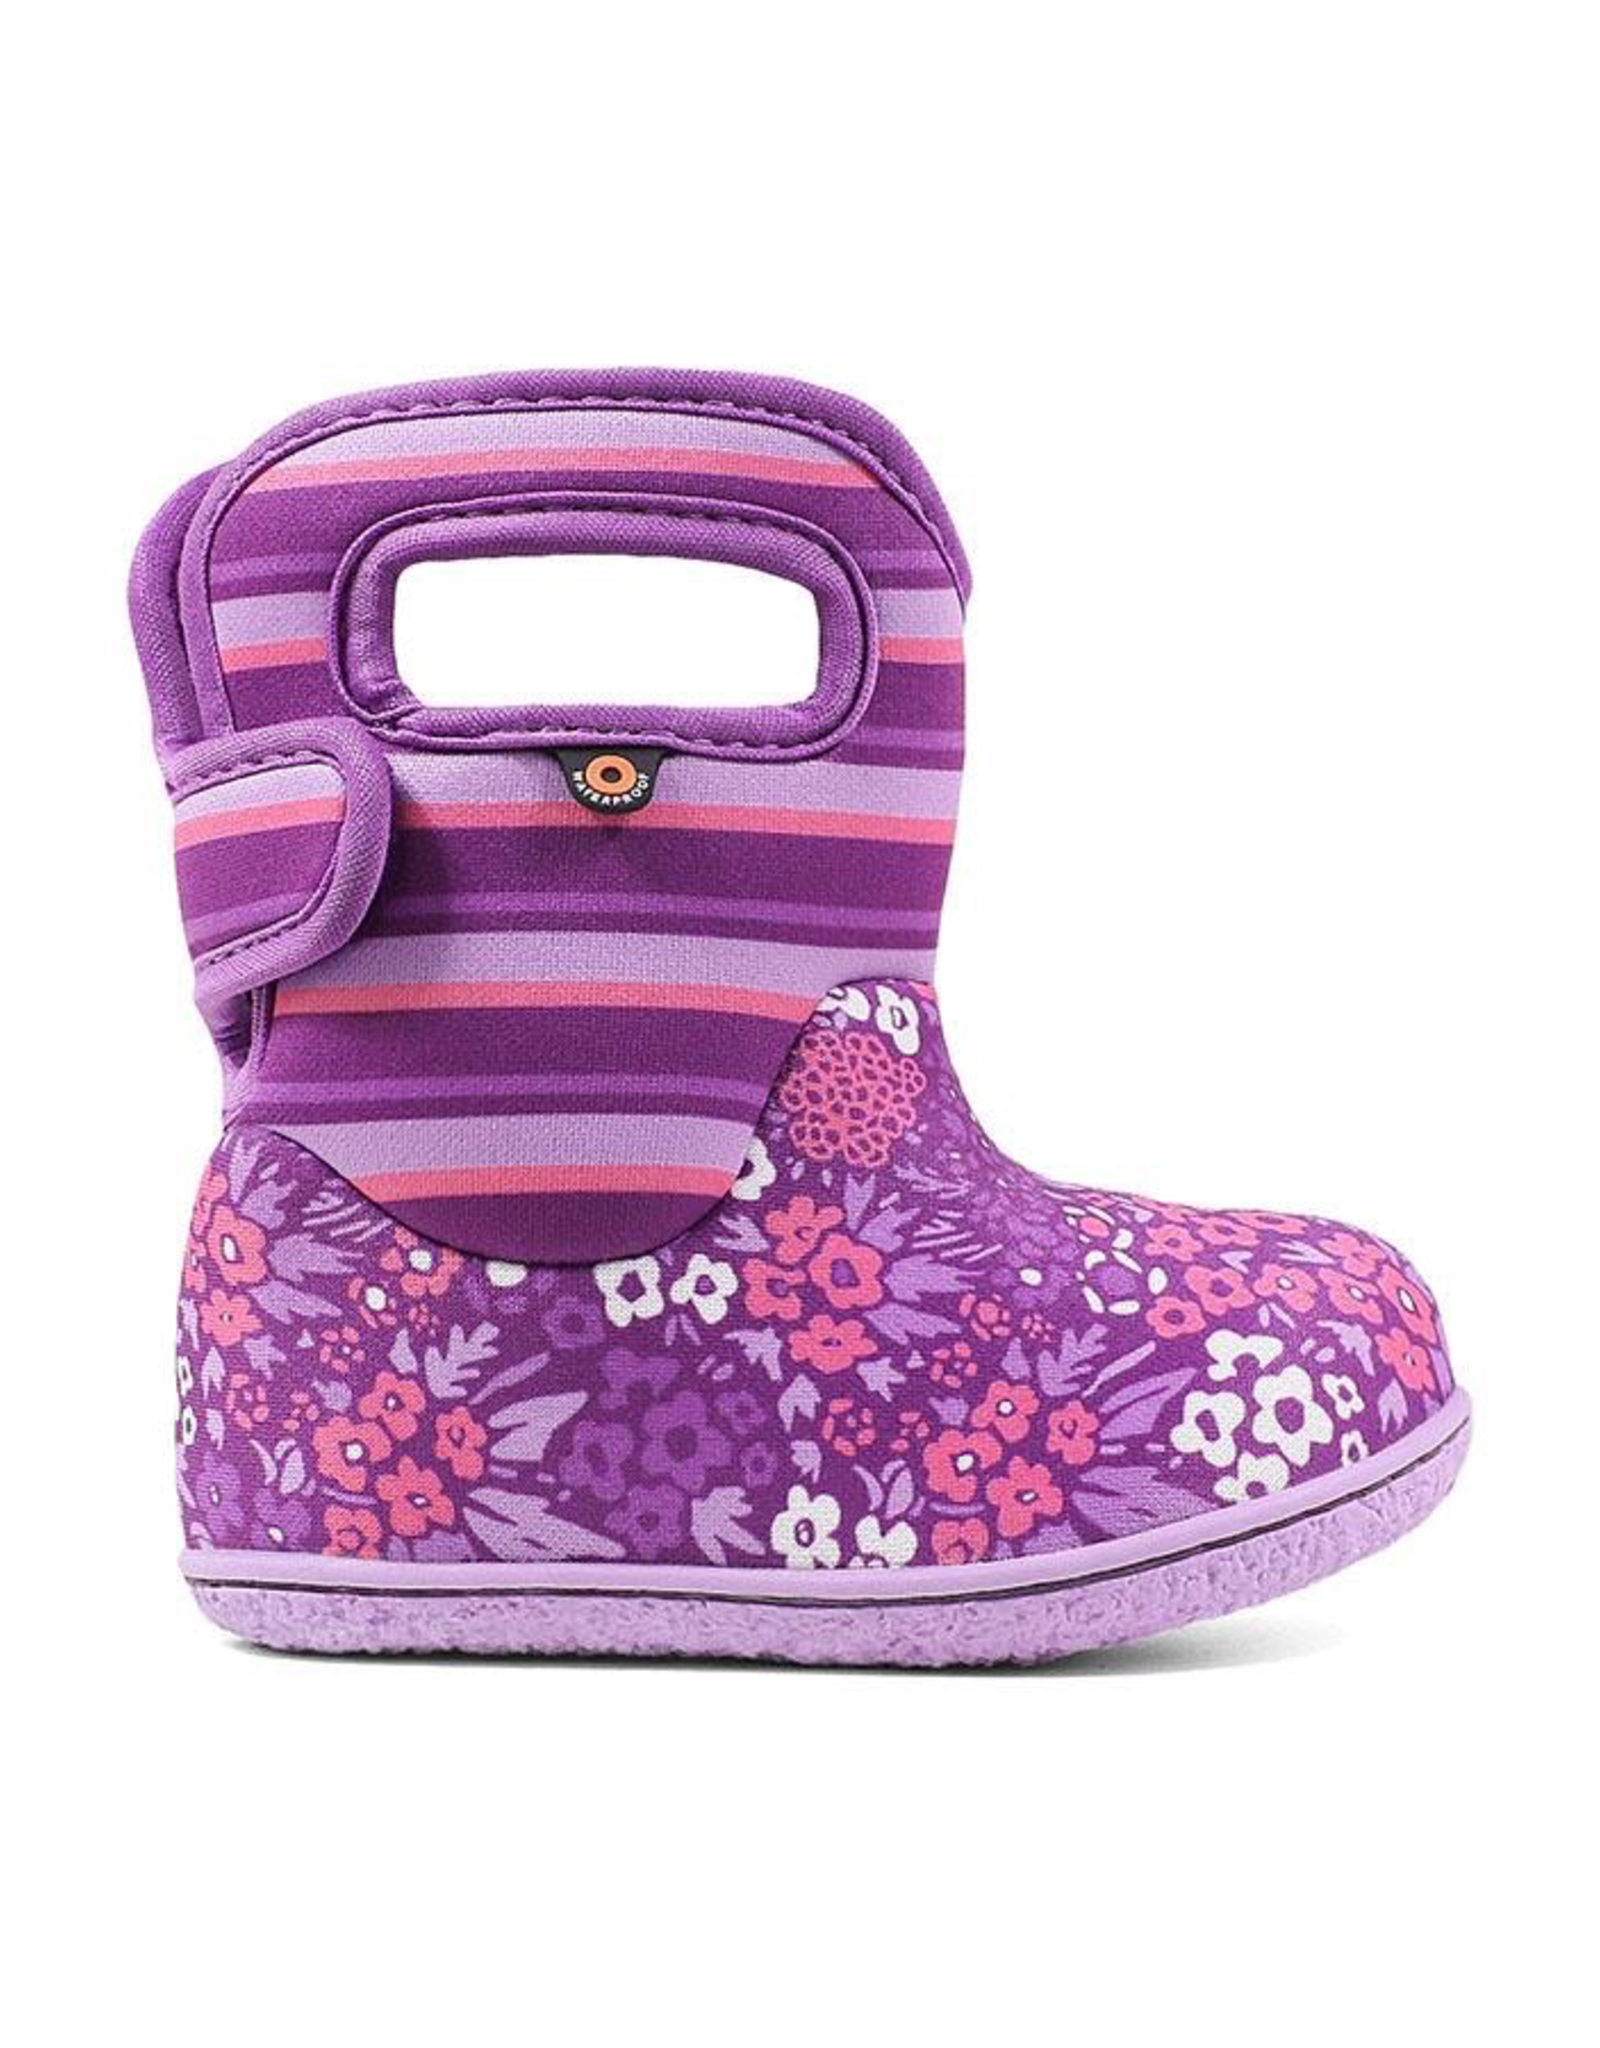 Bogs Baby Bogs NW Garden Purple Waterproof Boots